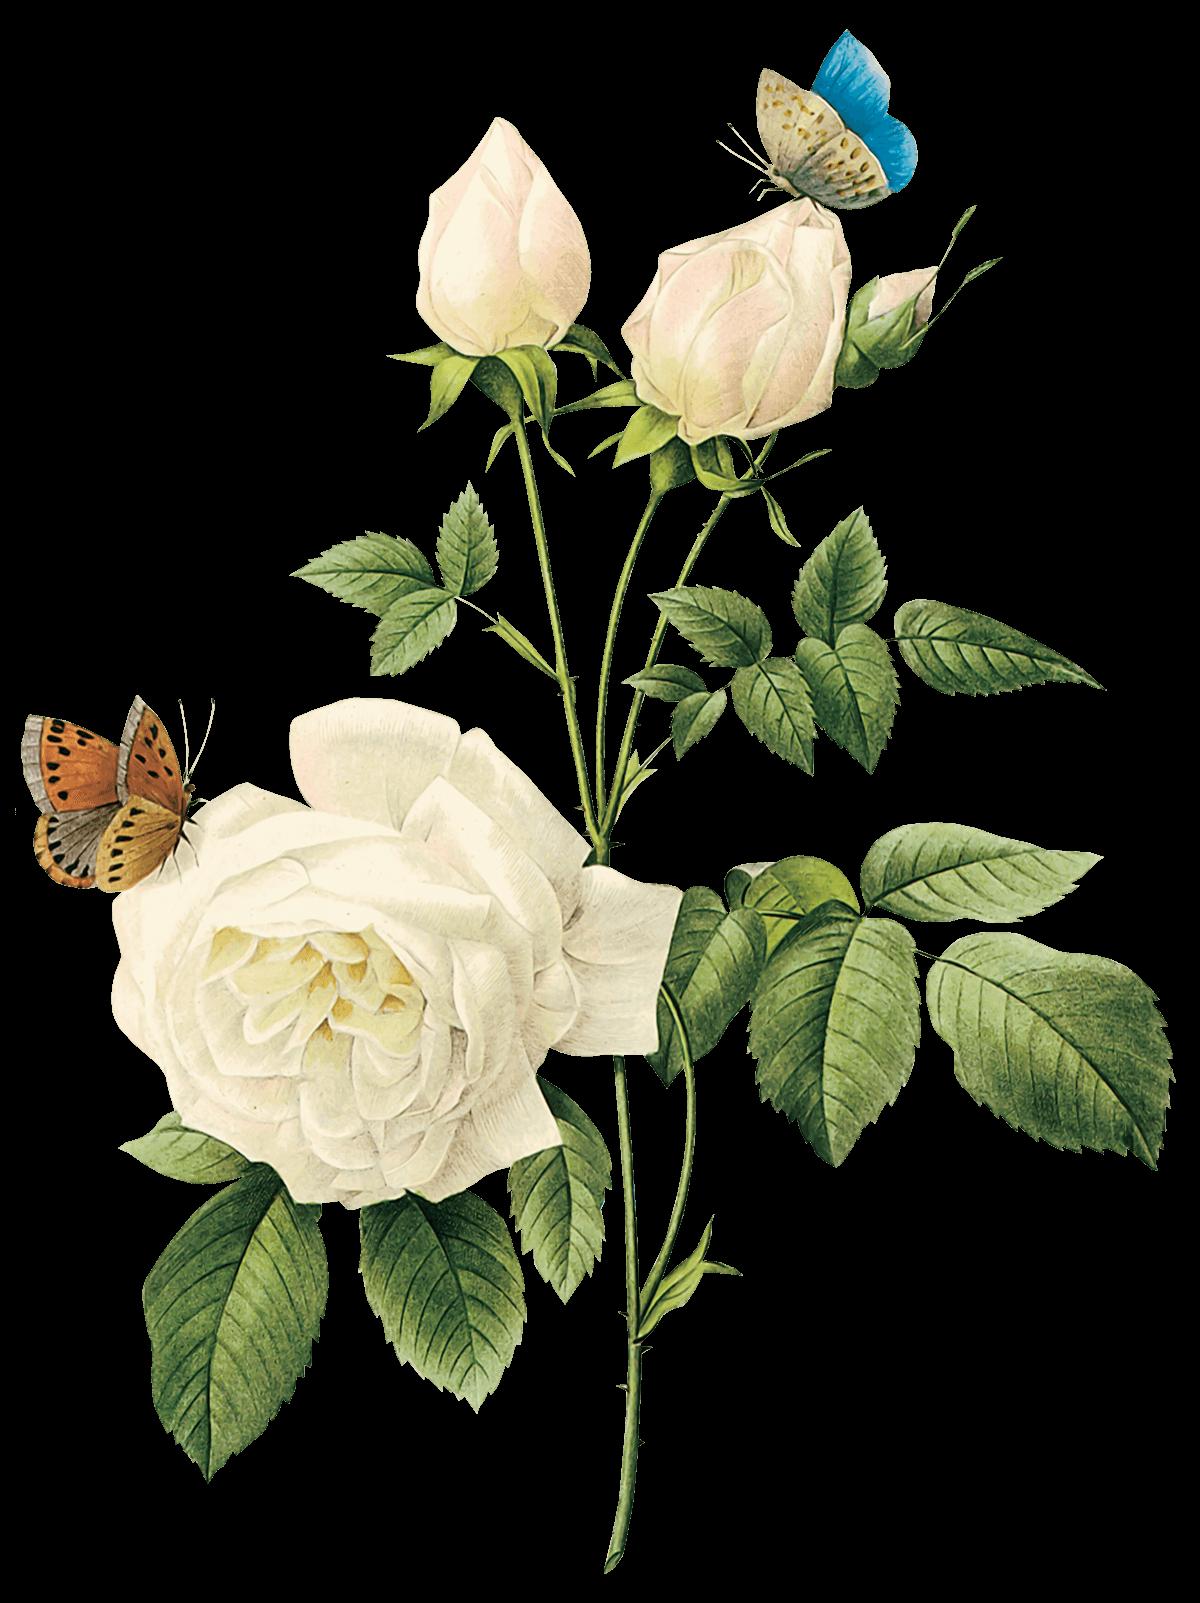 Download free white rose png image flower white rose png picture white rose png image flower white rose png picture png image mightylinksfo